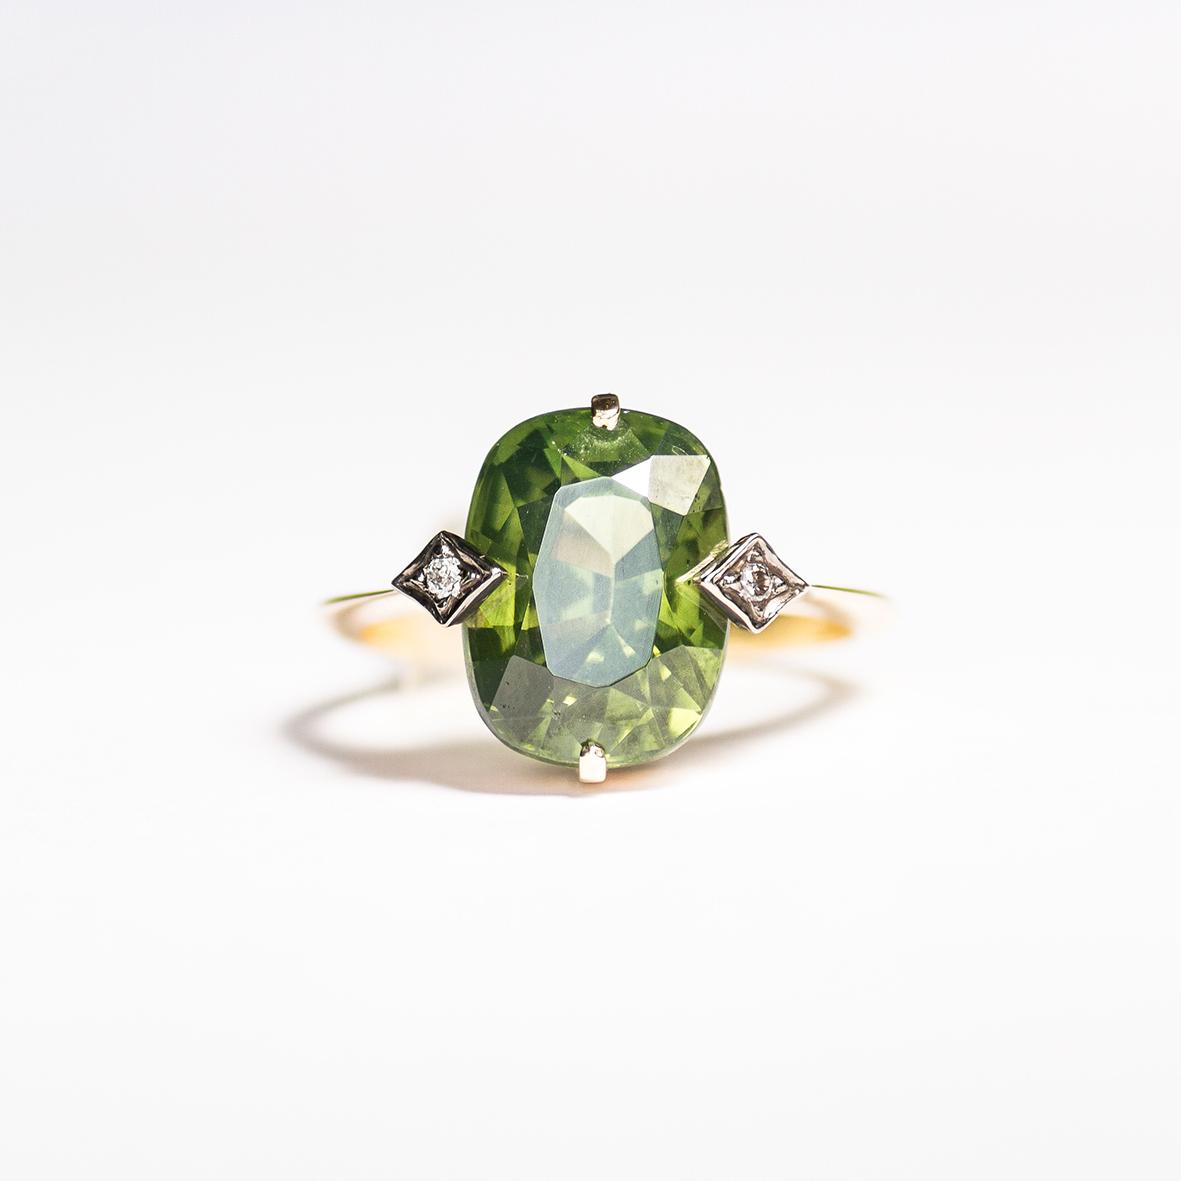 1. OONA_gems of ceylon_ficha1_green tourmaline ring